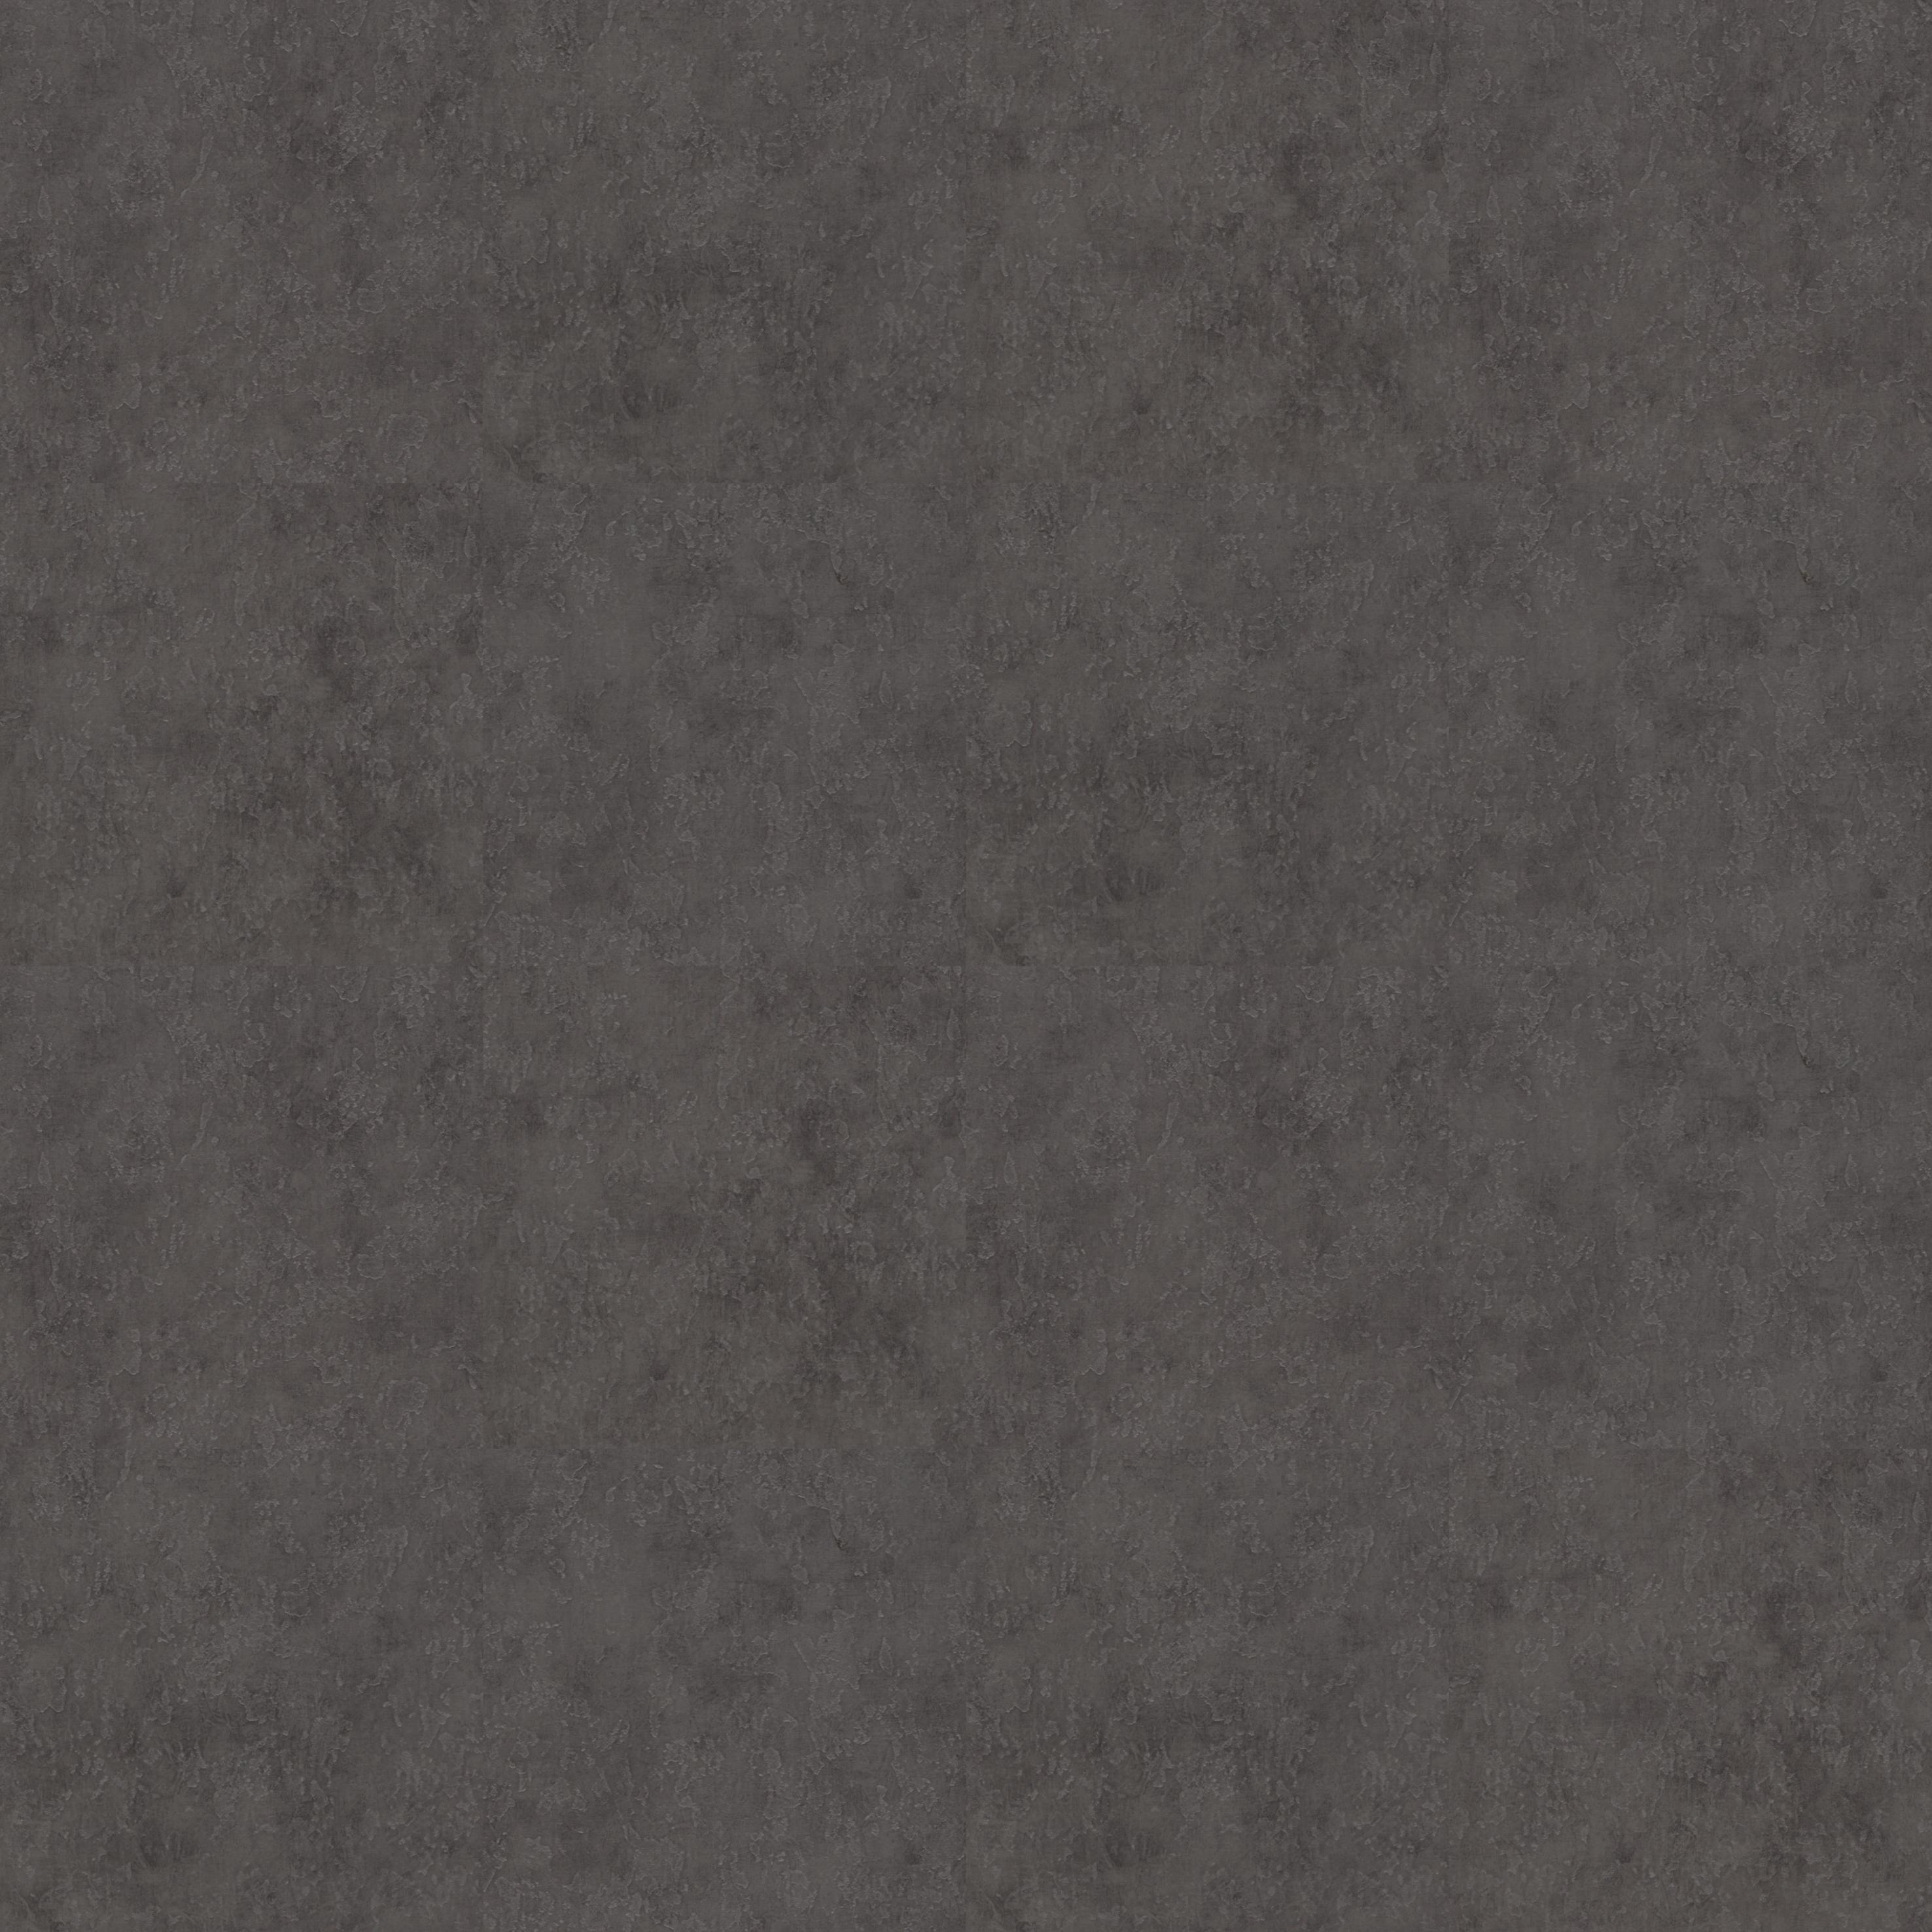 Allura_Stone_-s62408_grey_slate